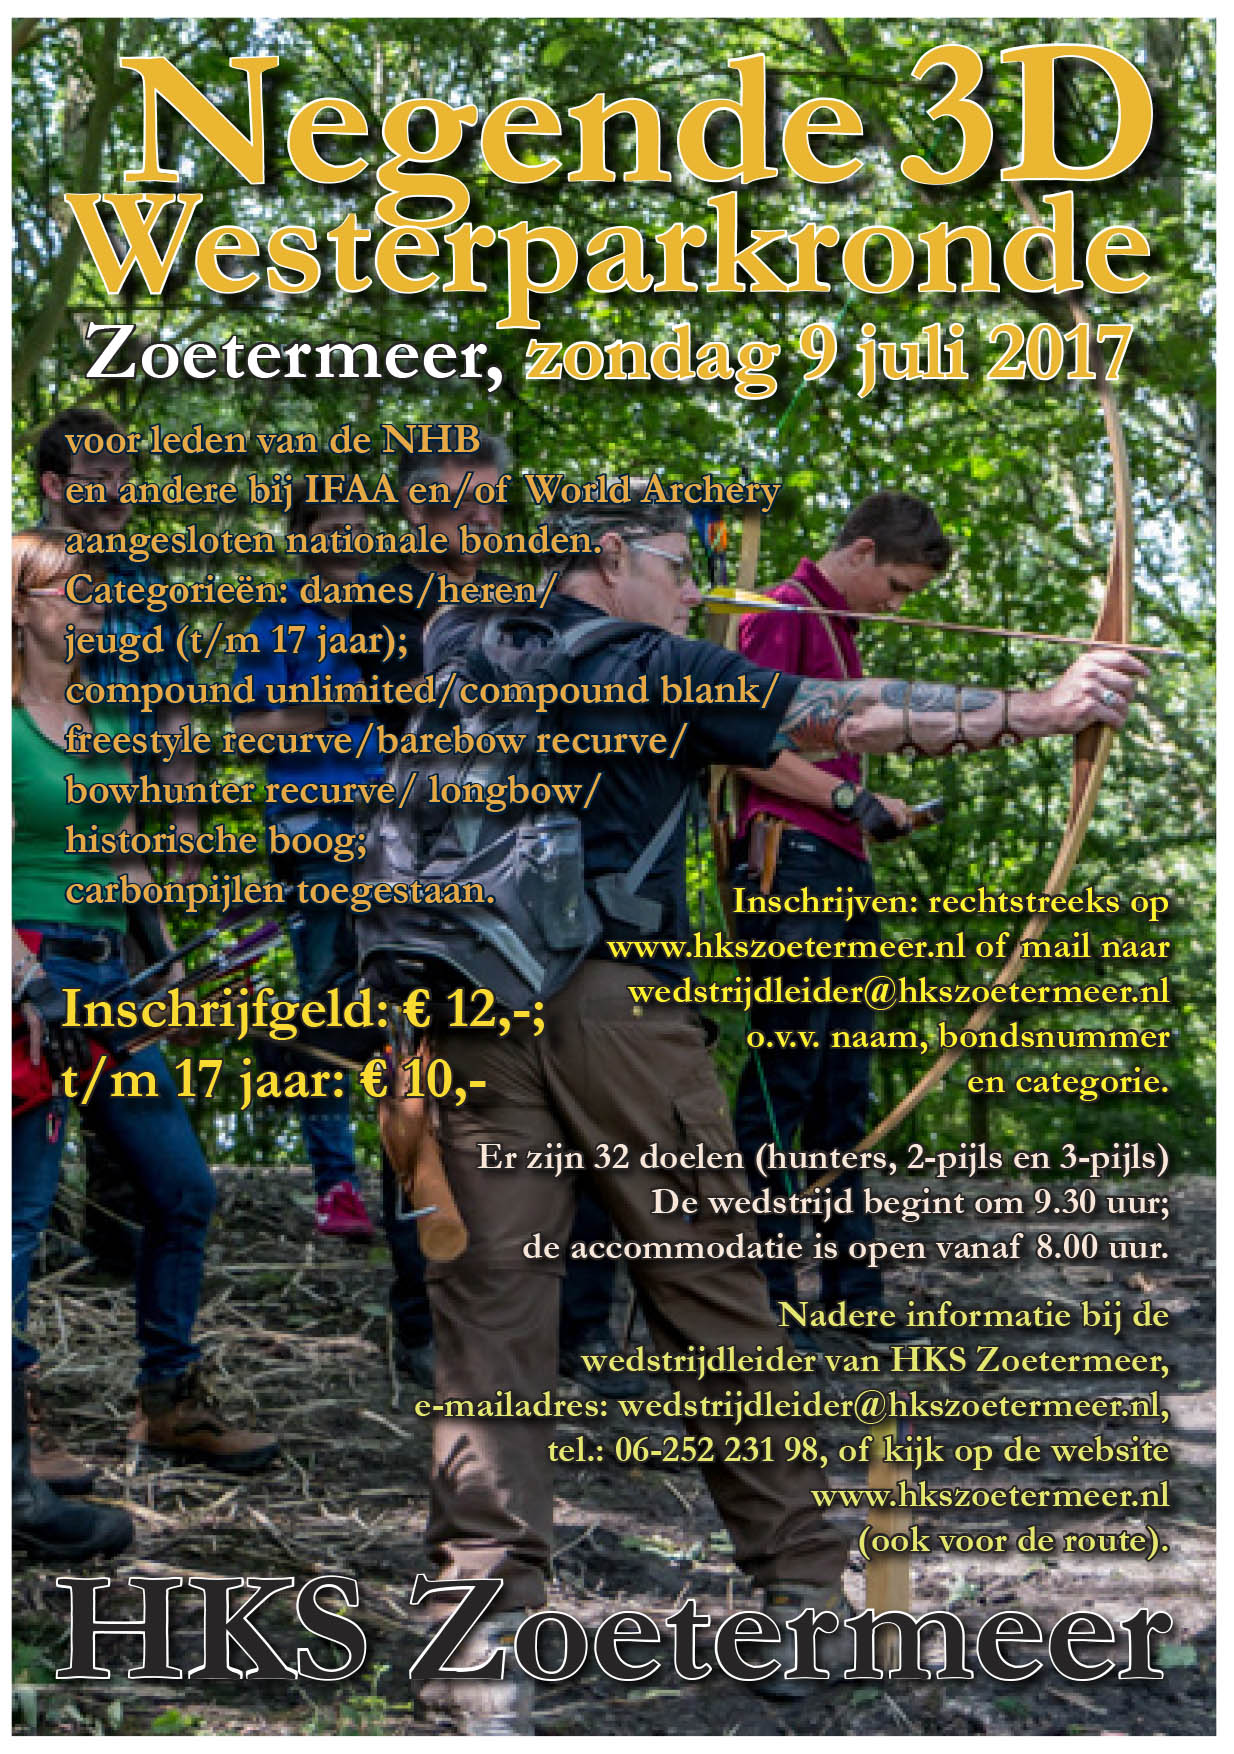 9de Westerparkronde @ HKS | Zoetermeer | Zuid-Holland | Nederland